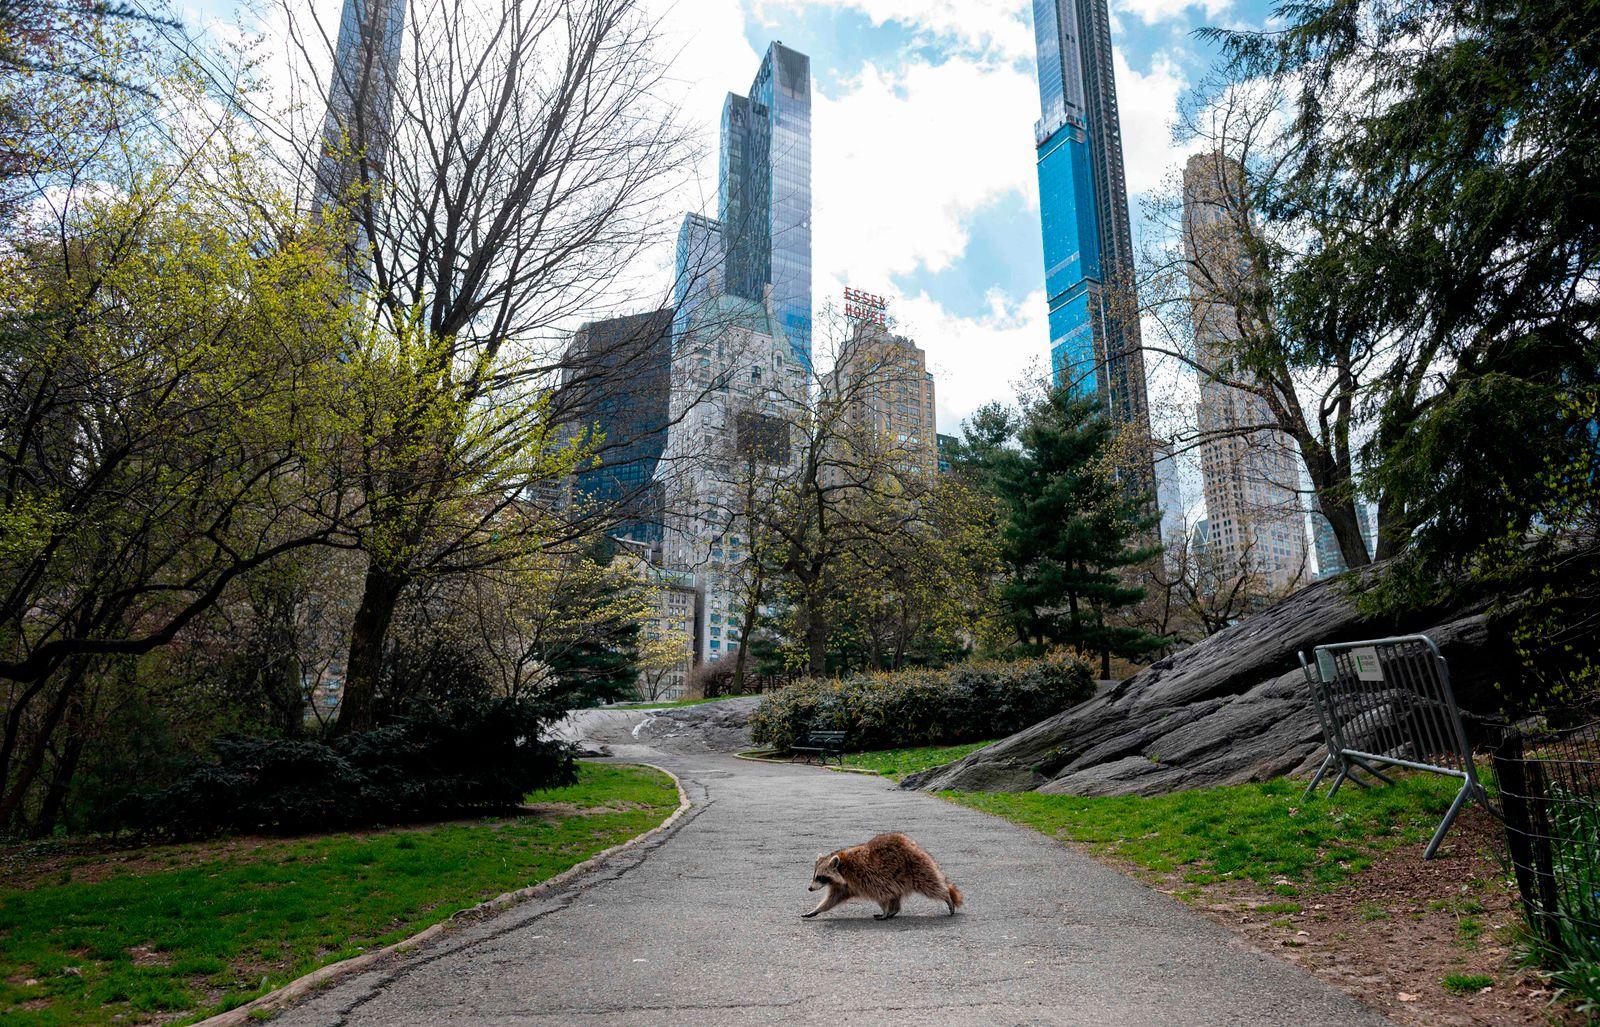 Coronavirus outbreak transforms New York's Central Park